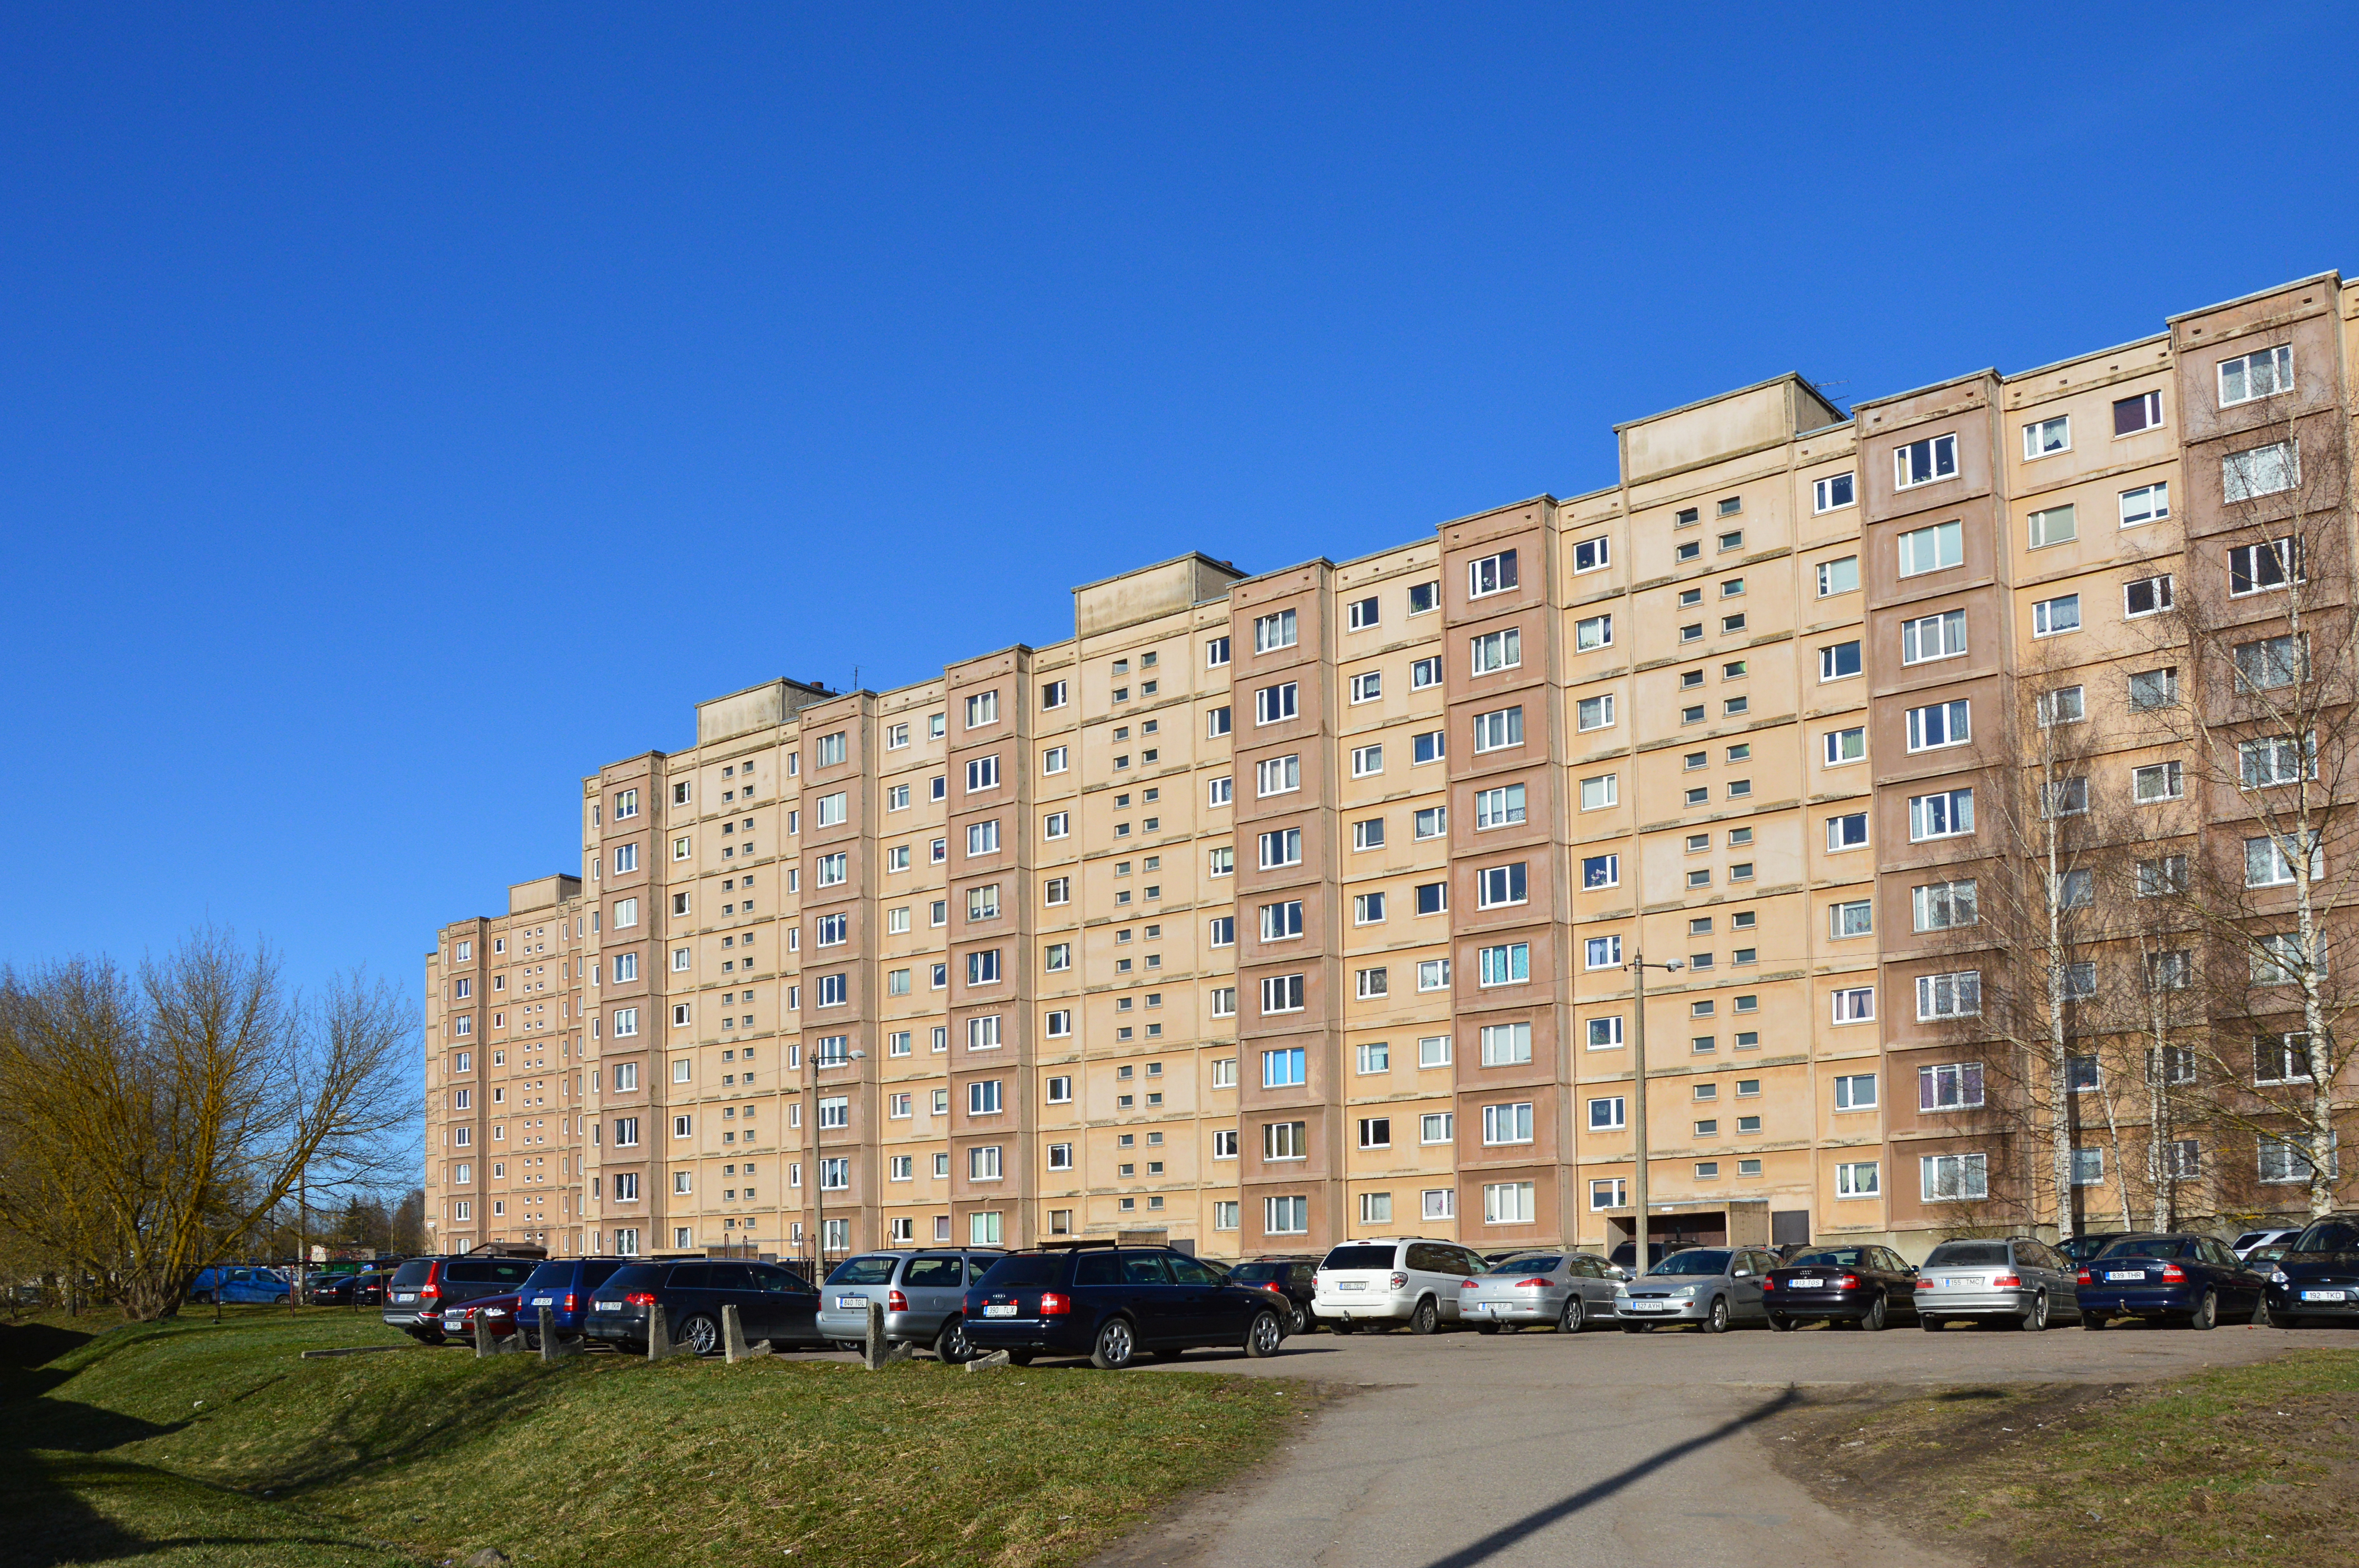 Panel building - Wikipedia